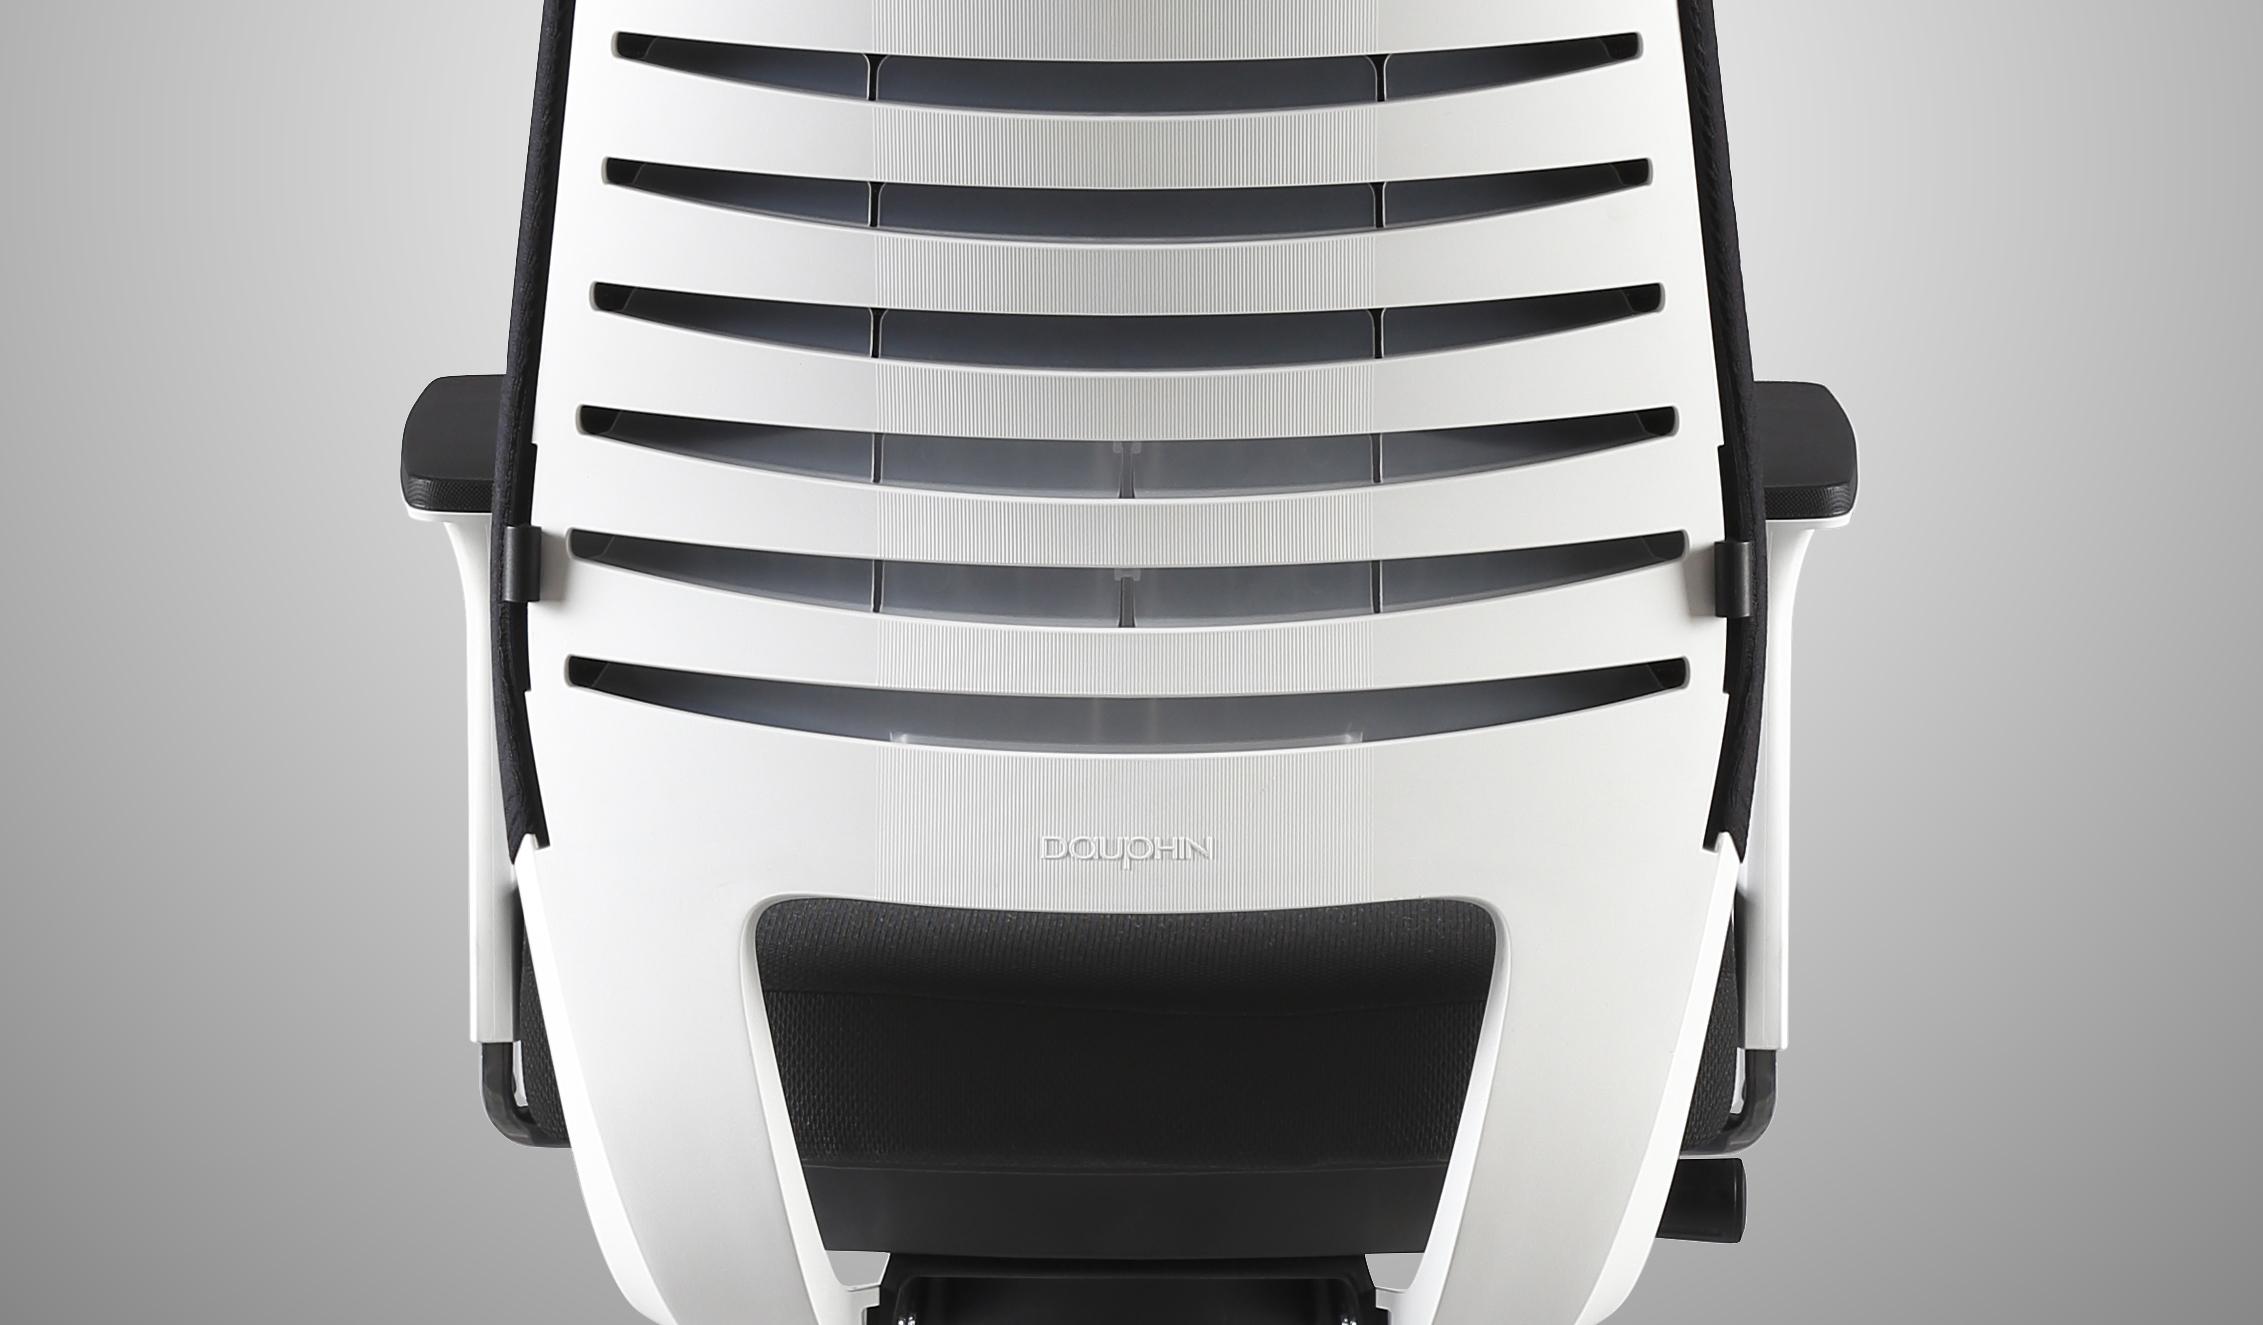 06 x-code chair crop for presentation.jpg